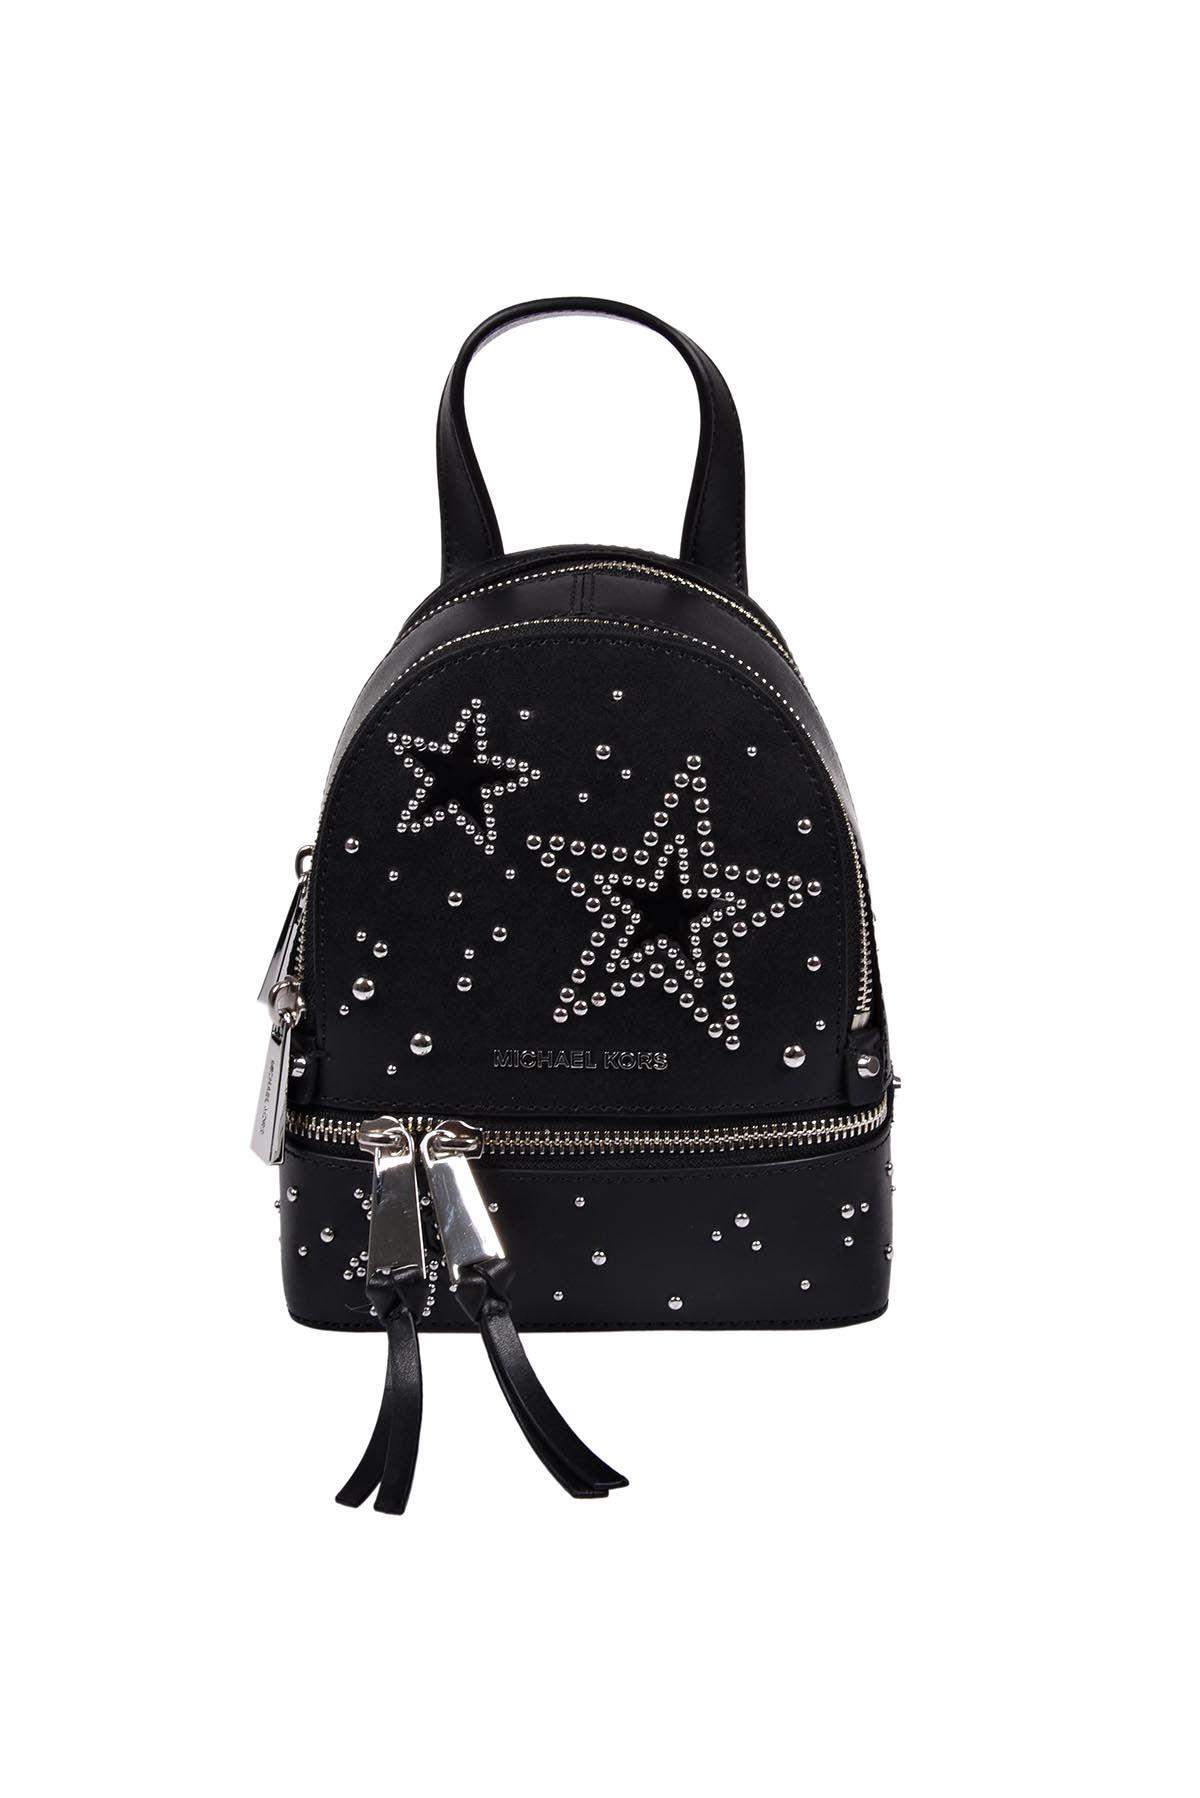 91dd59d0919f ... official store michael kors rhea zip xs backpack. michaelkors bags  leather backpacks b1538 9f07b